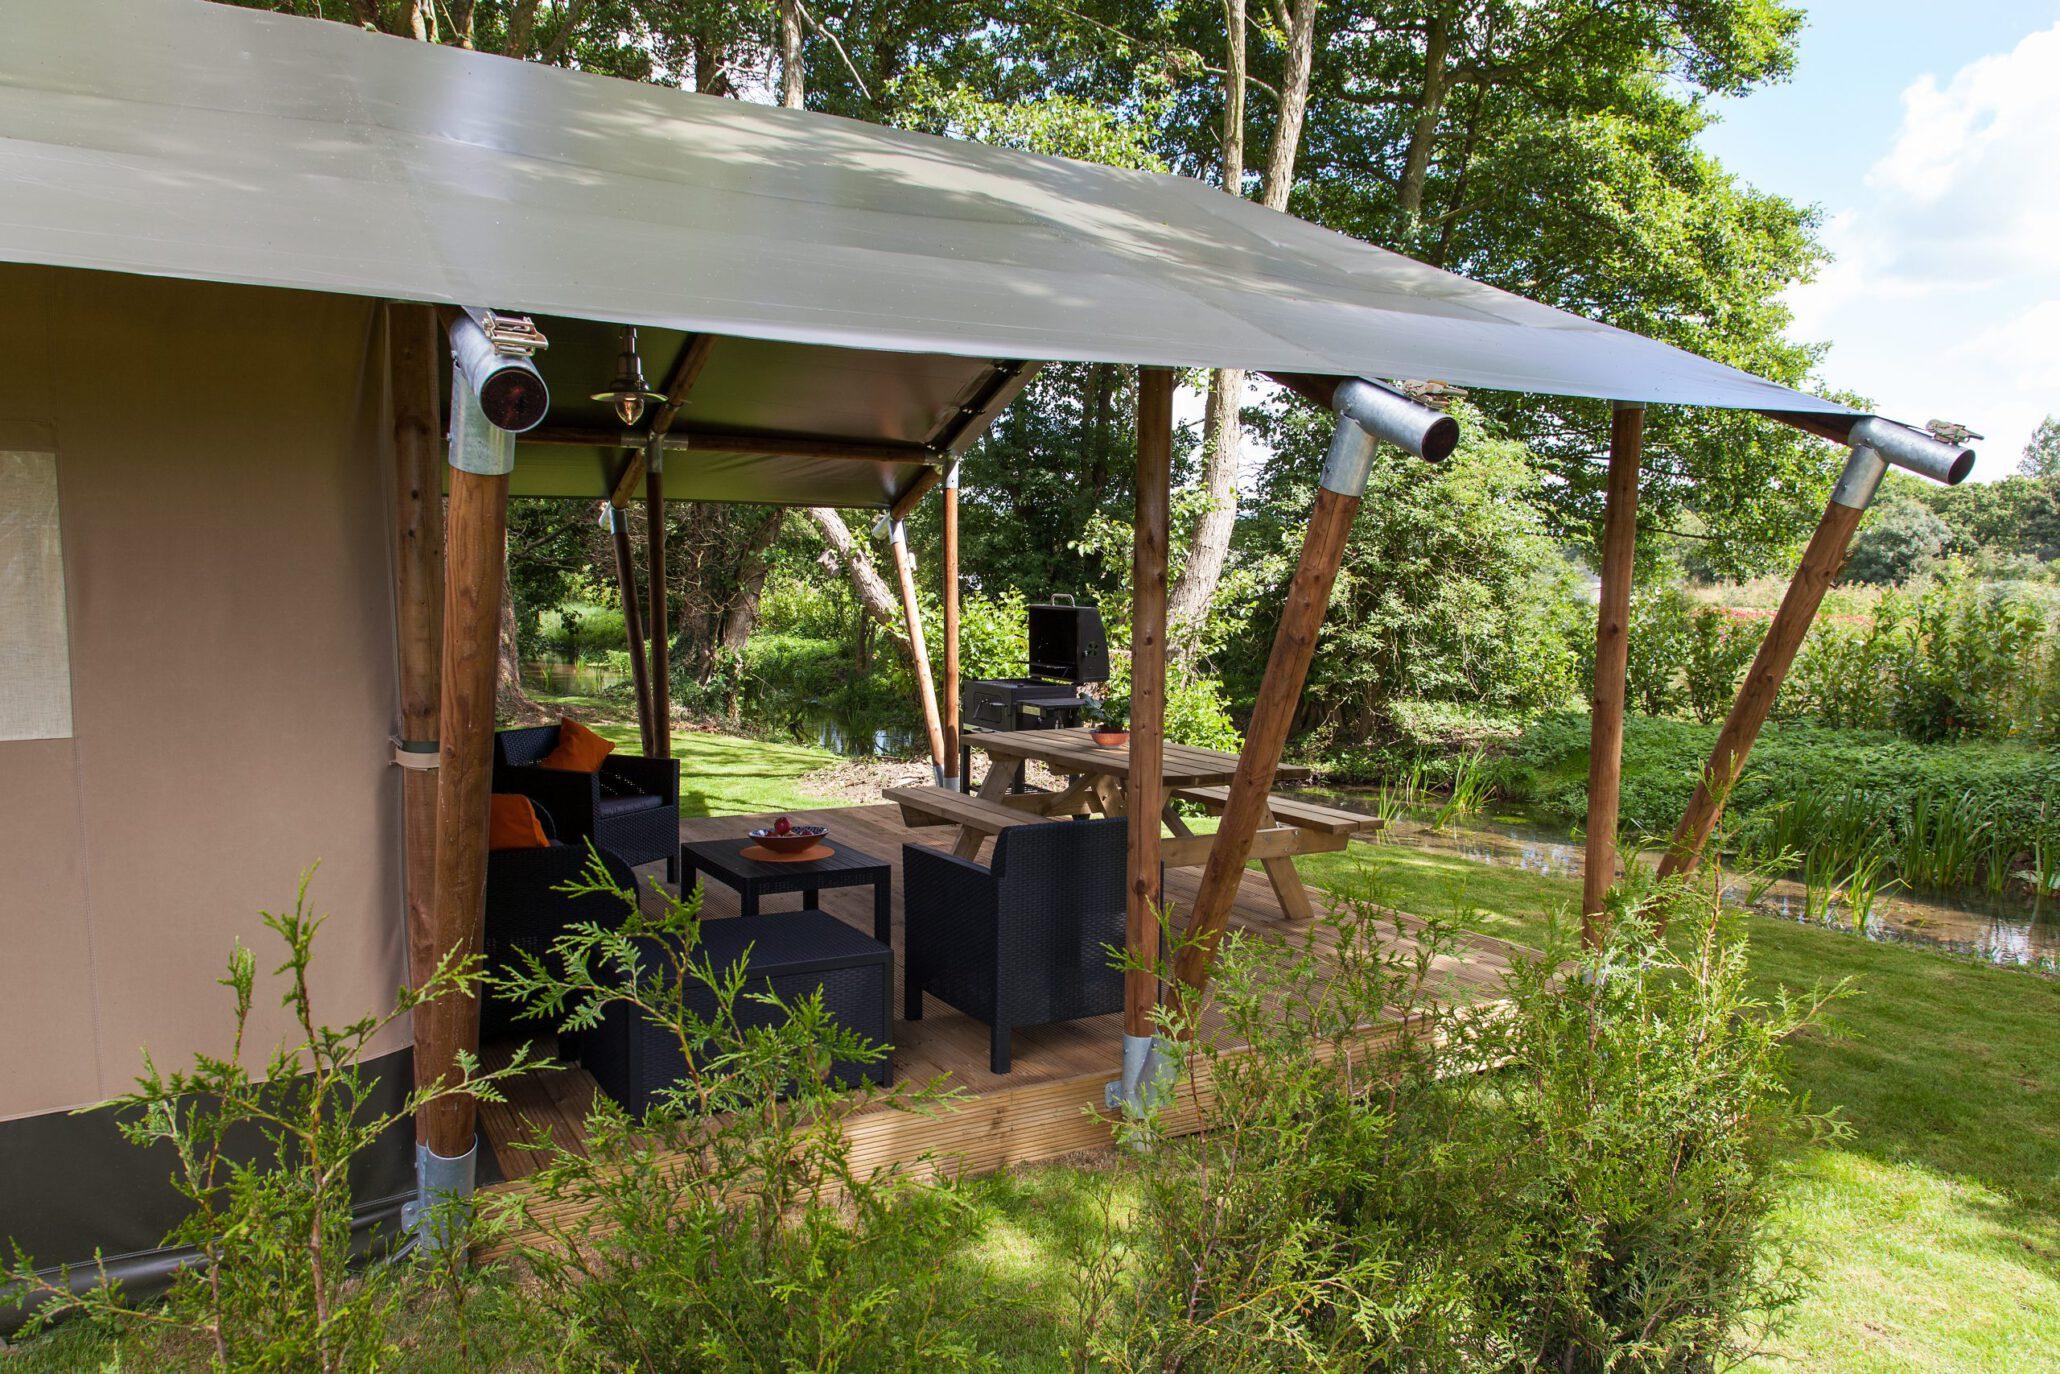 Concierge-Camping-UK-Lodge-en-Wood